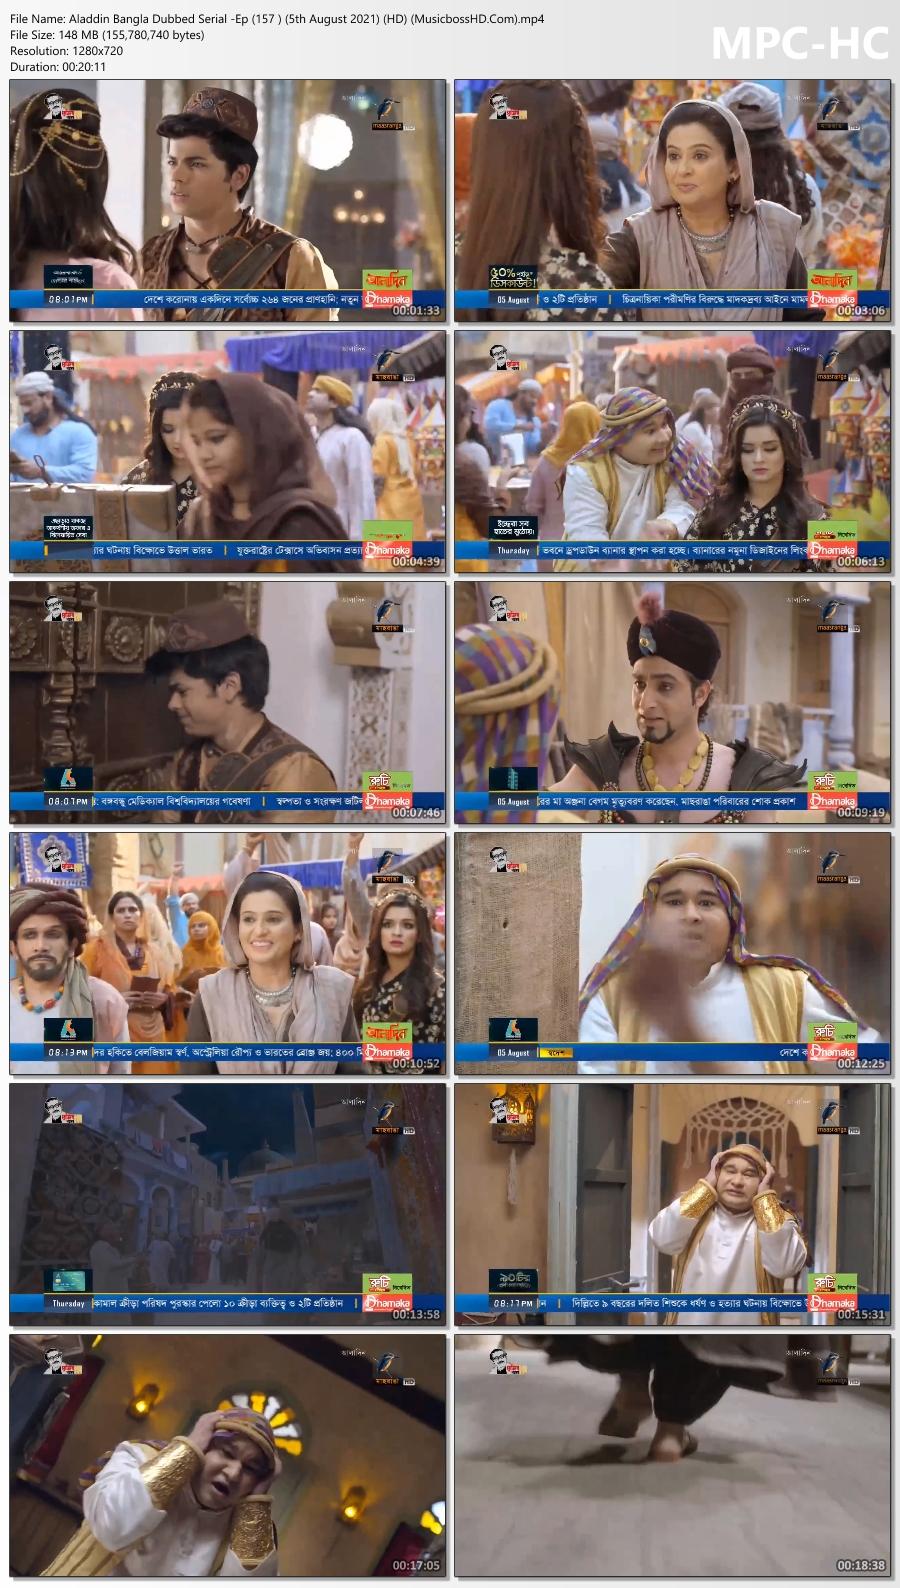 Aladdin-Bangla-Dubbed-Serial-Ep-157-5th-August-2021-HD-Musicboss-HD-Com-mp4-thumbs